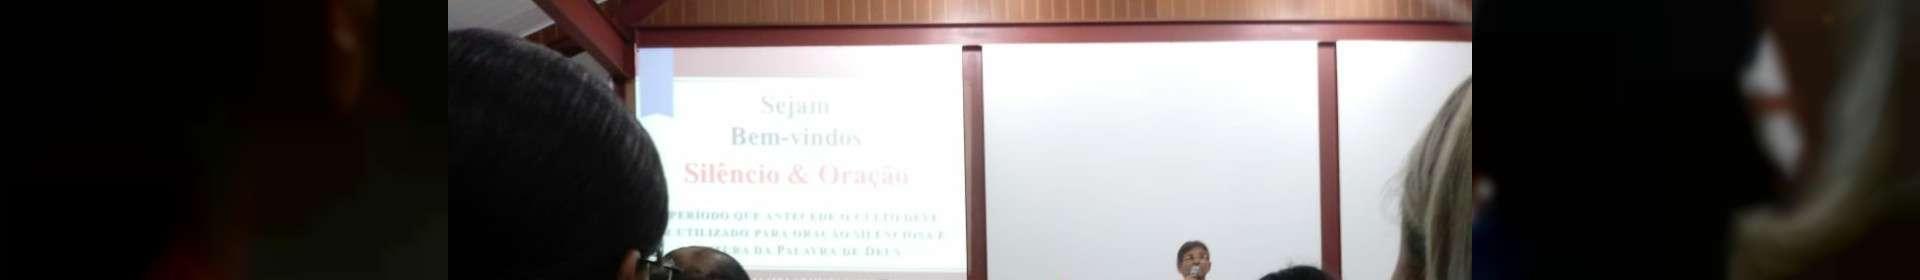 Igreja Cristã Maranata de Piabetá (RJ) realiza culto de encerramento da Oficina de Libras